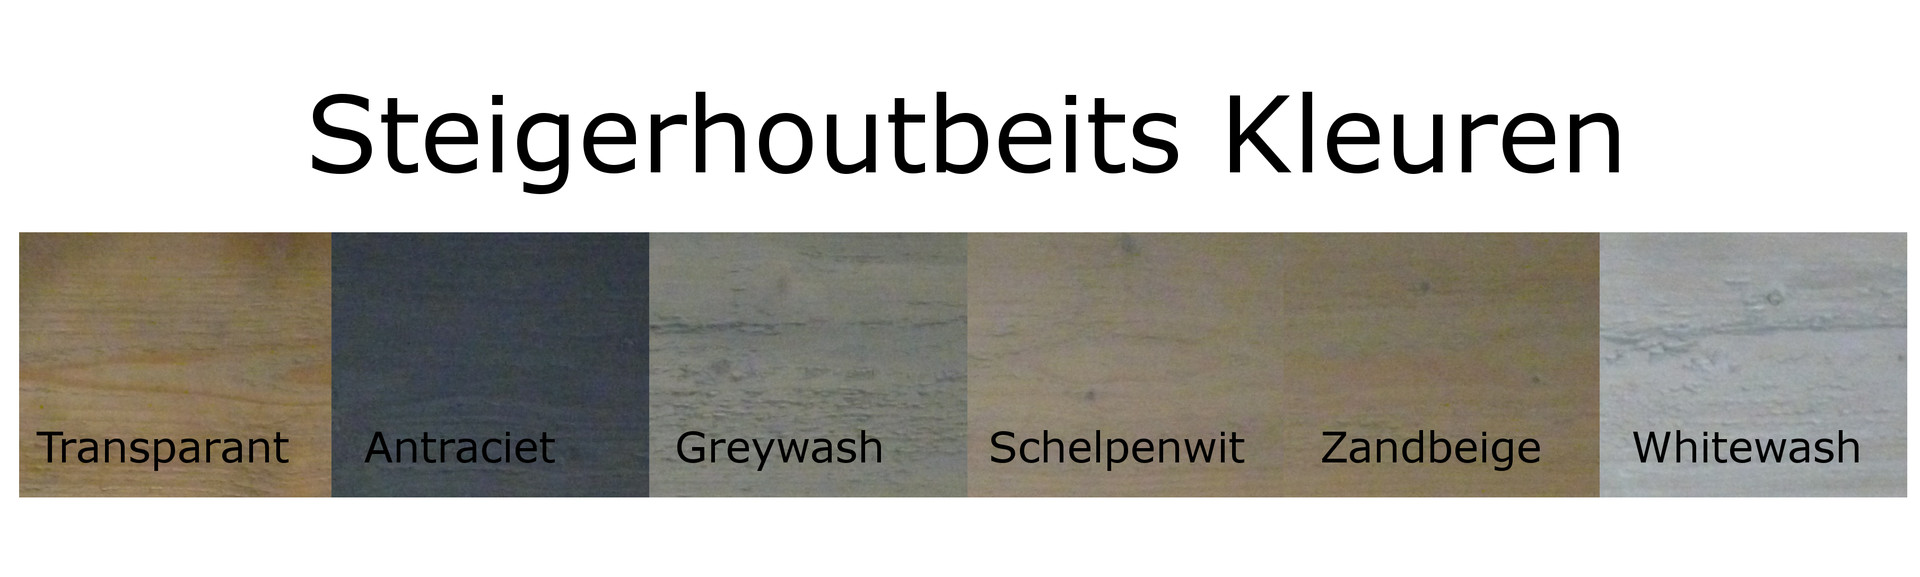 Bedwelming Steigerhout beits uit voorraad - xsteigerhout NT63